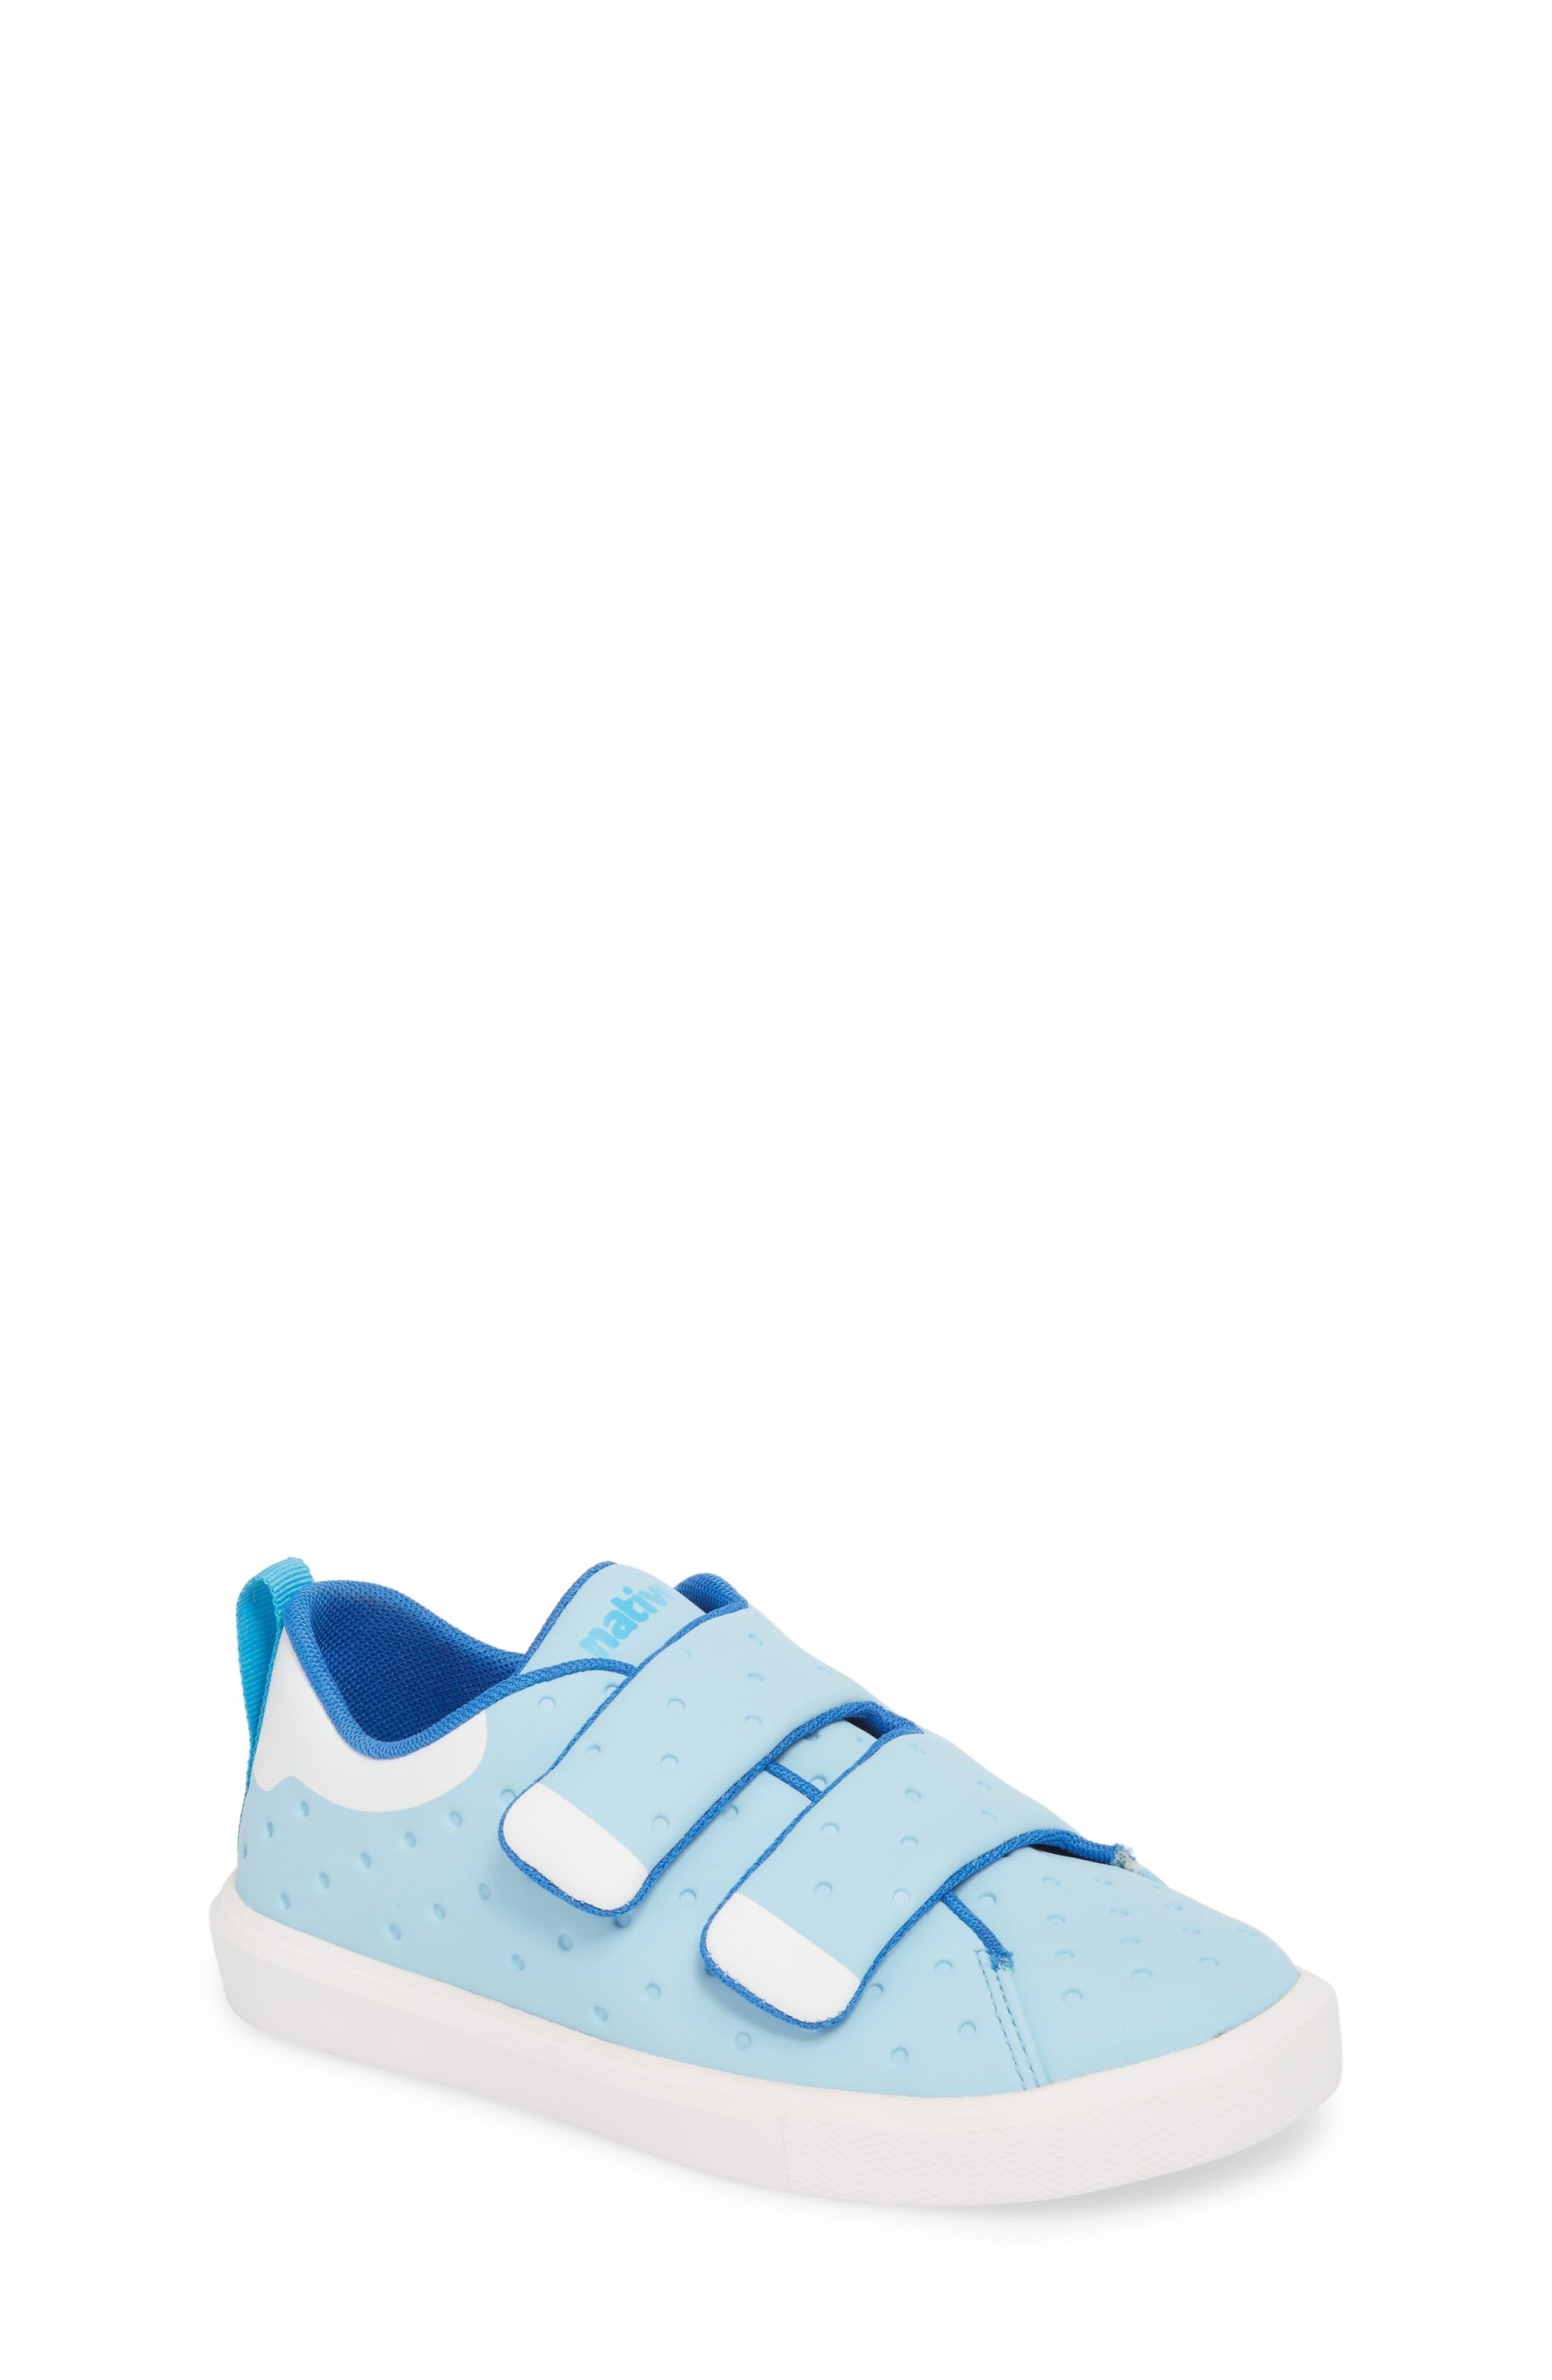 Monaco Sneaker,                         Main,                         color, Sky Blue/ Shell White